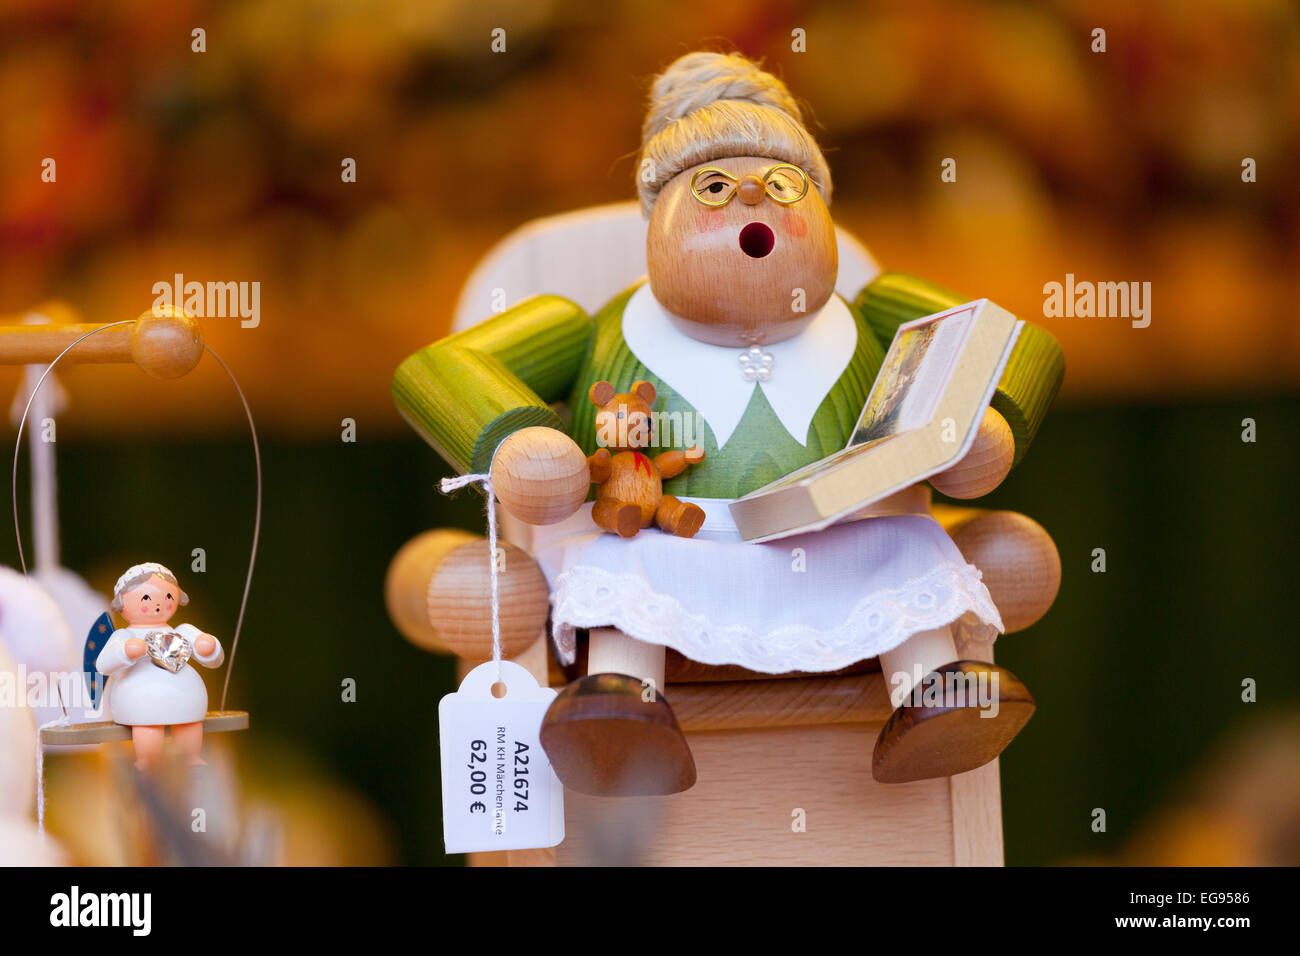 Wooden Christmas Decoration at the Dresden Strietzelmarkt Christmas Market, Dresden, Germany - Stock Image